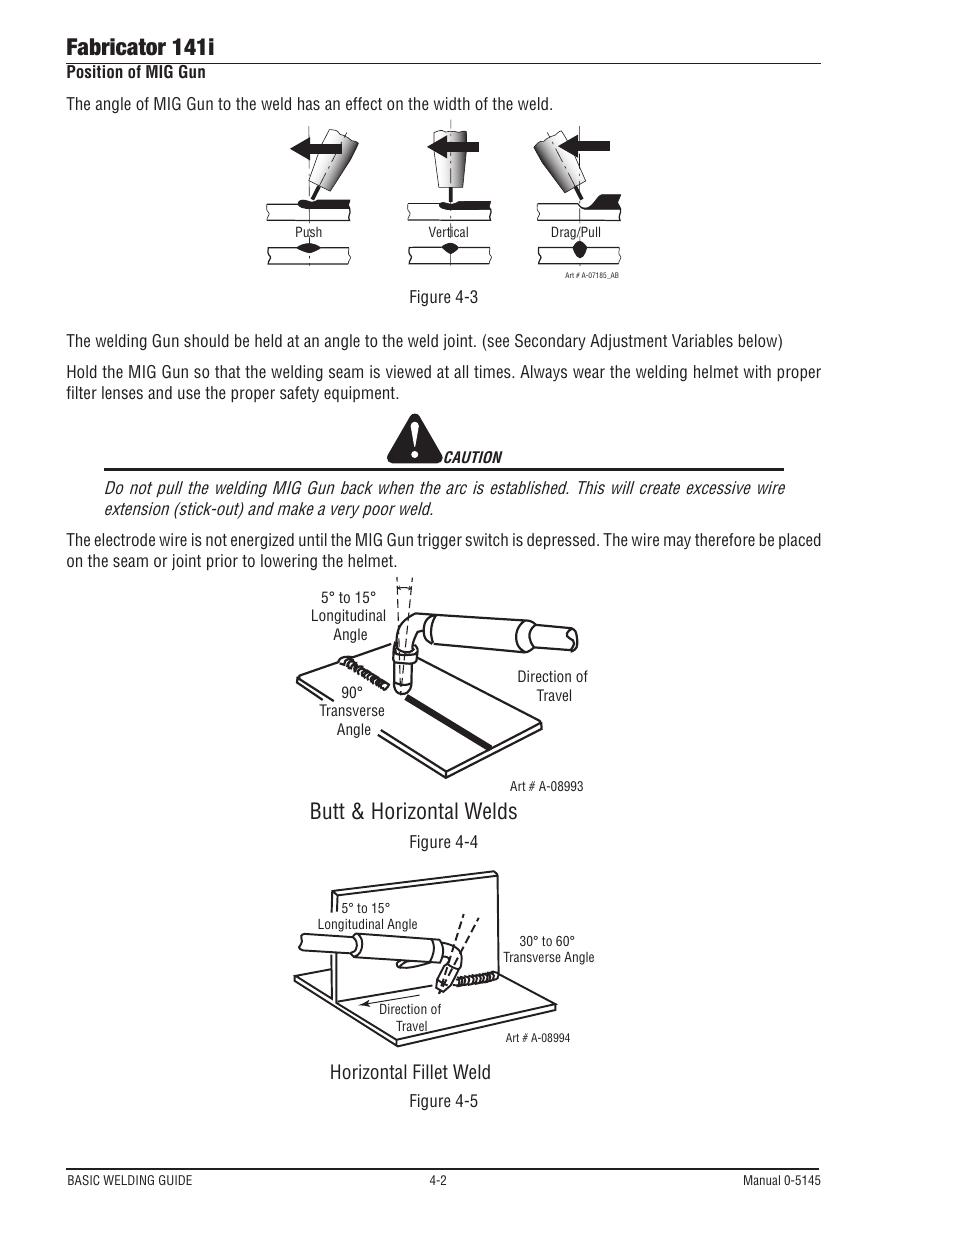 hight resolution of fabricator 141i butt horizontal welds horizontal fillet weld tweco 141i fabricator user manual page 62 104